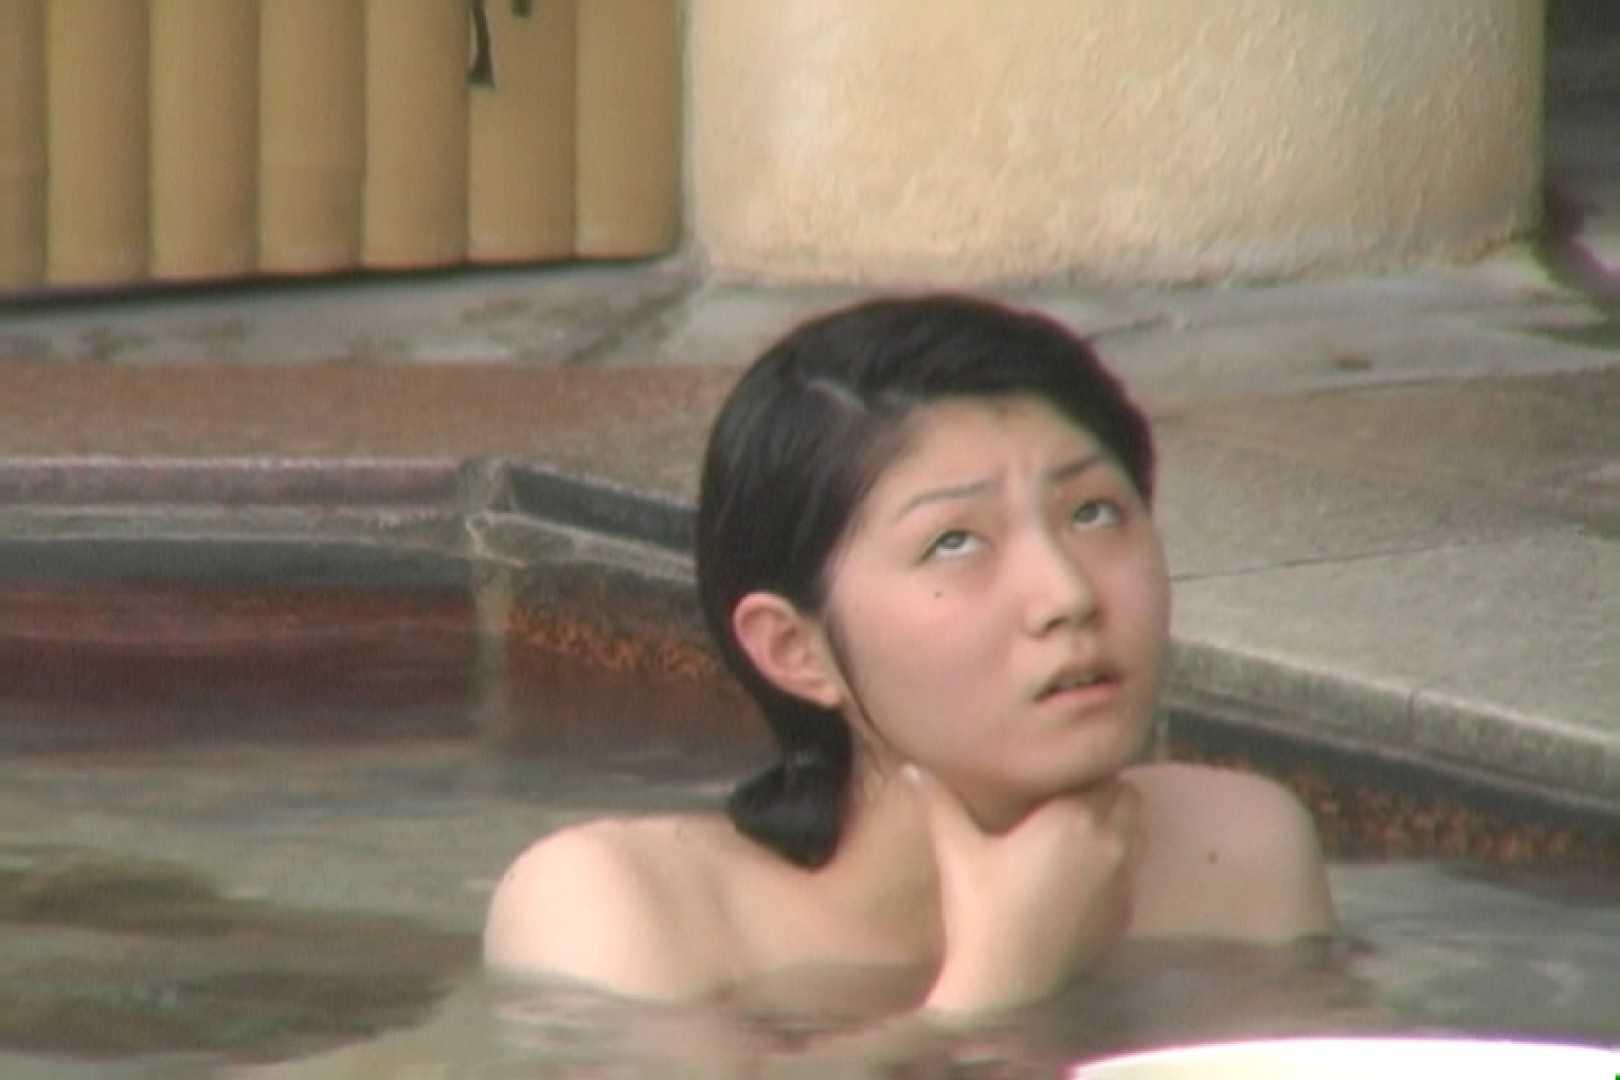 Aquaな露天風呂Vol.579 盗撮 | HなOL  53pic 23